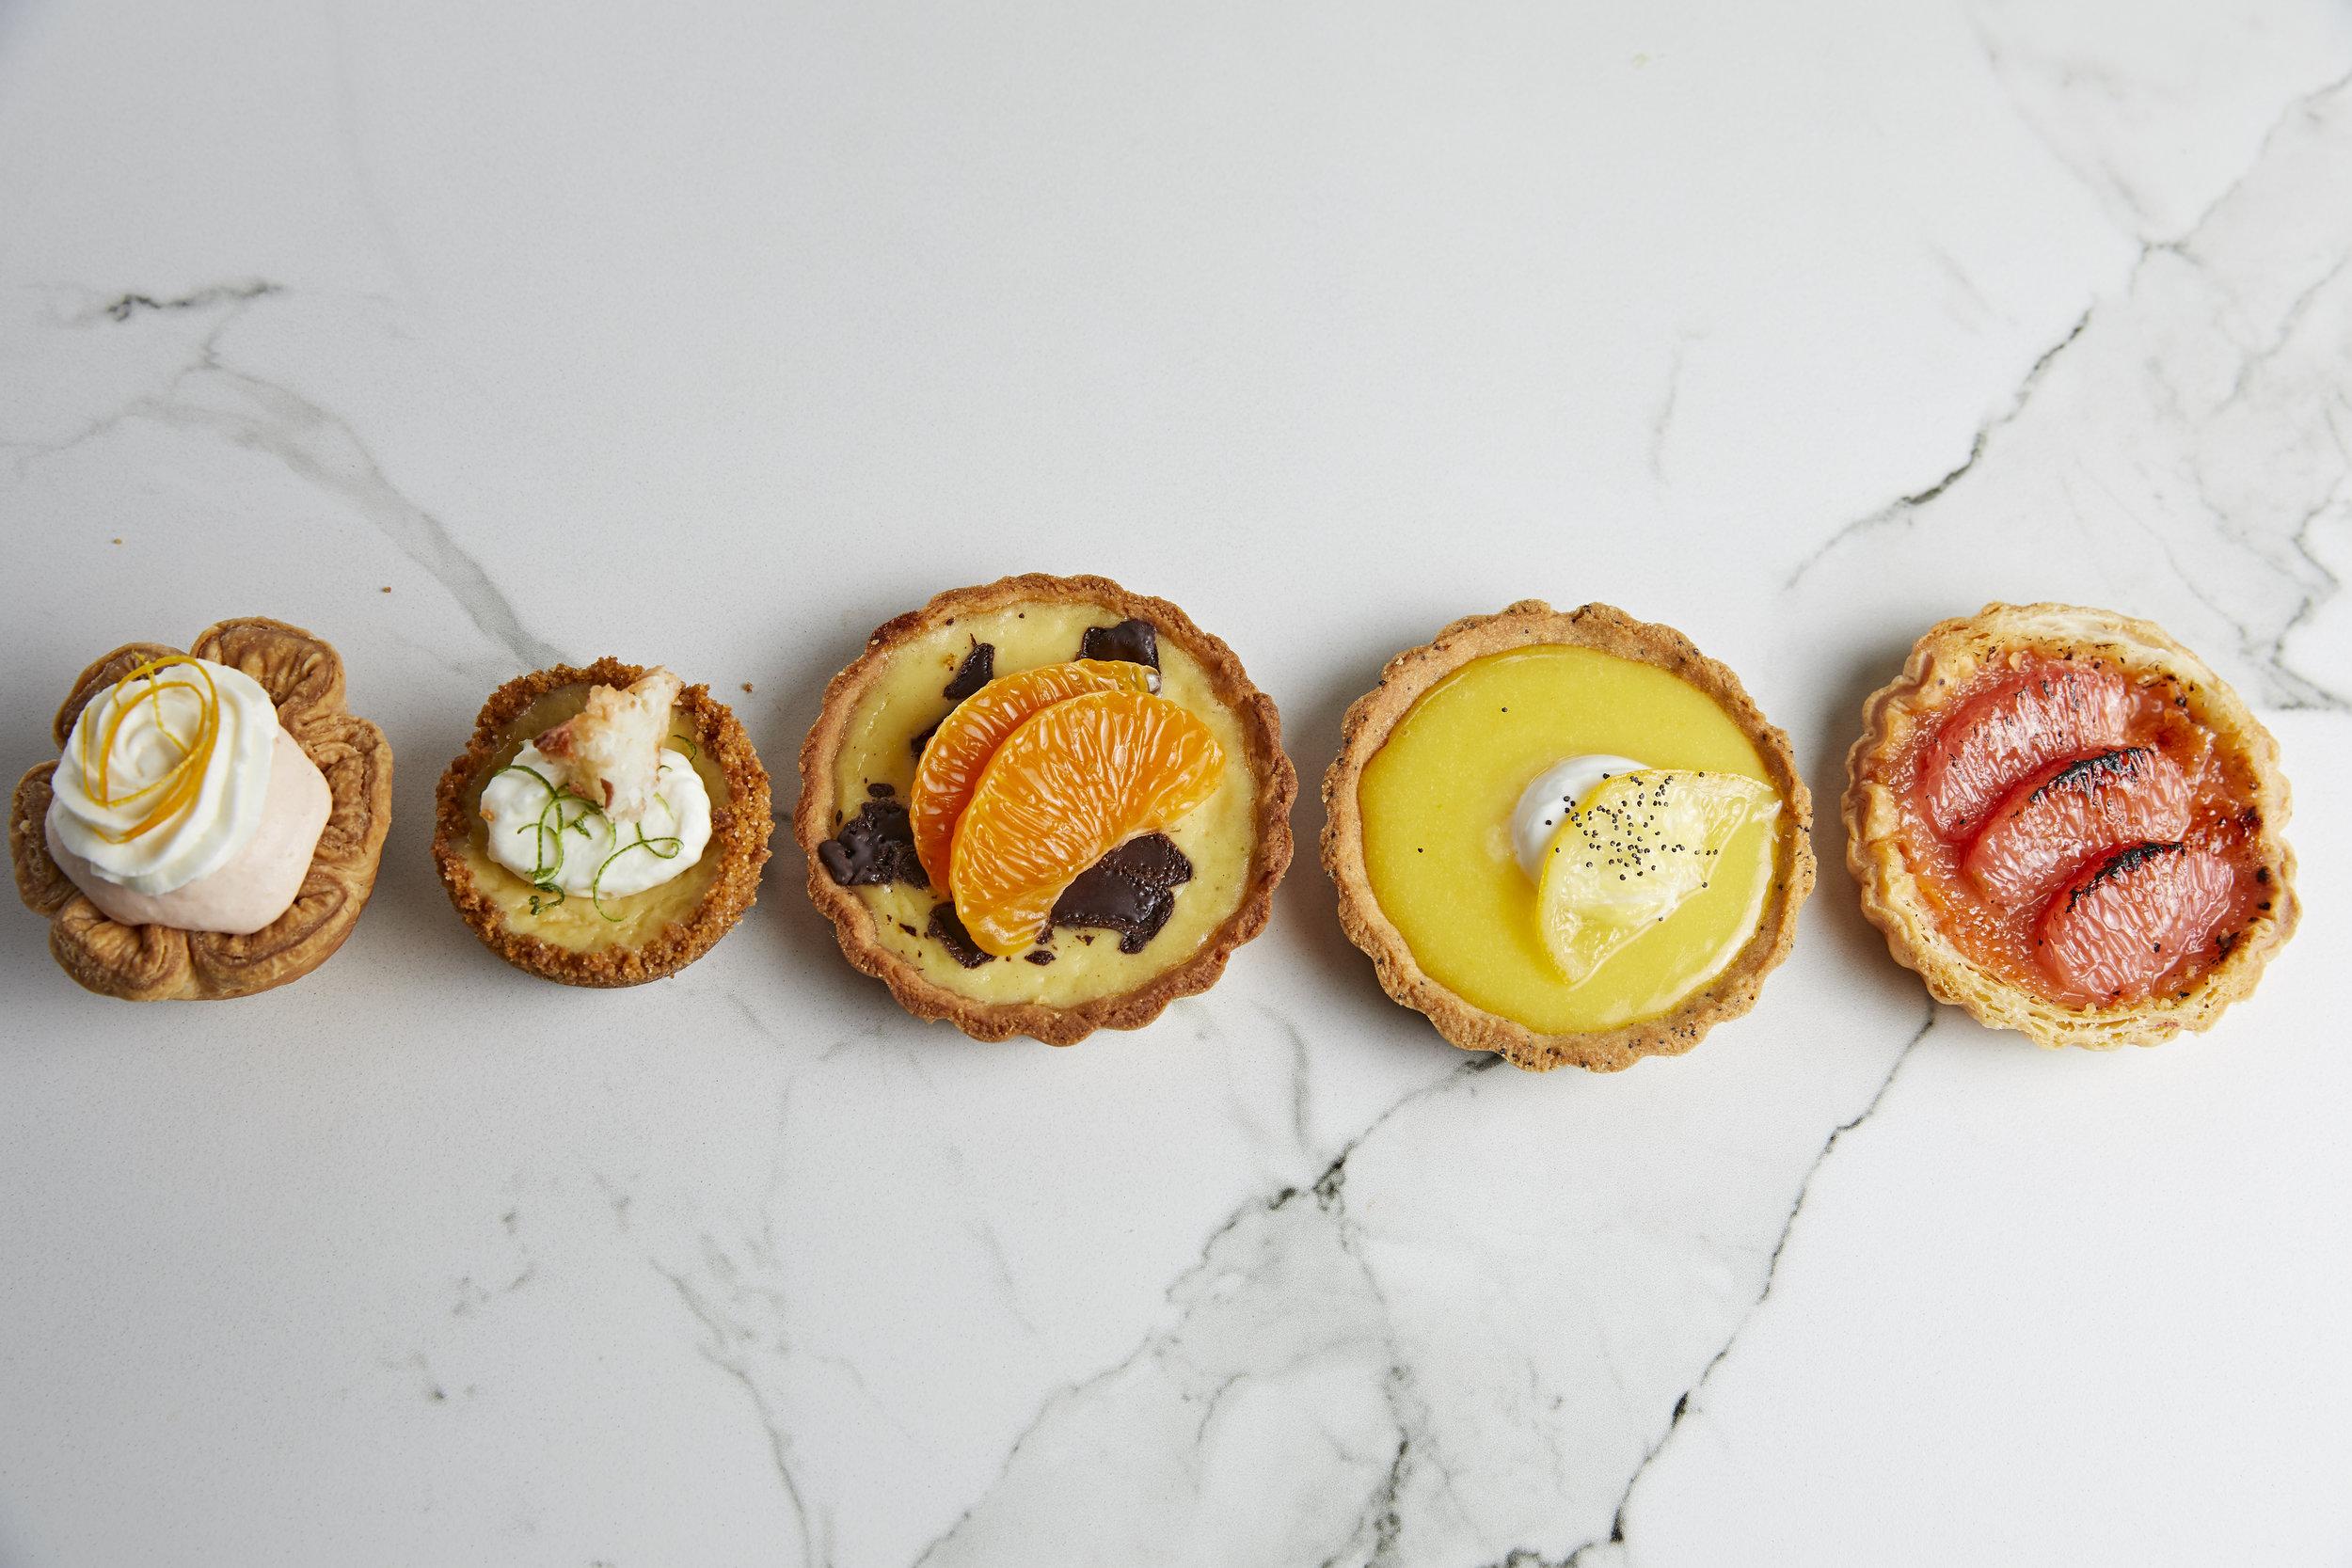 Pictured L to R: Orange Creamsicle, Coconut Lime, Ricotta Tangerine Tart, Lemon Poppyseed Tart, Grapefruit Creme Brulee